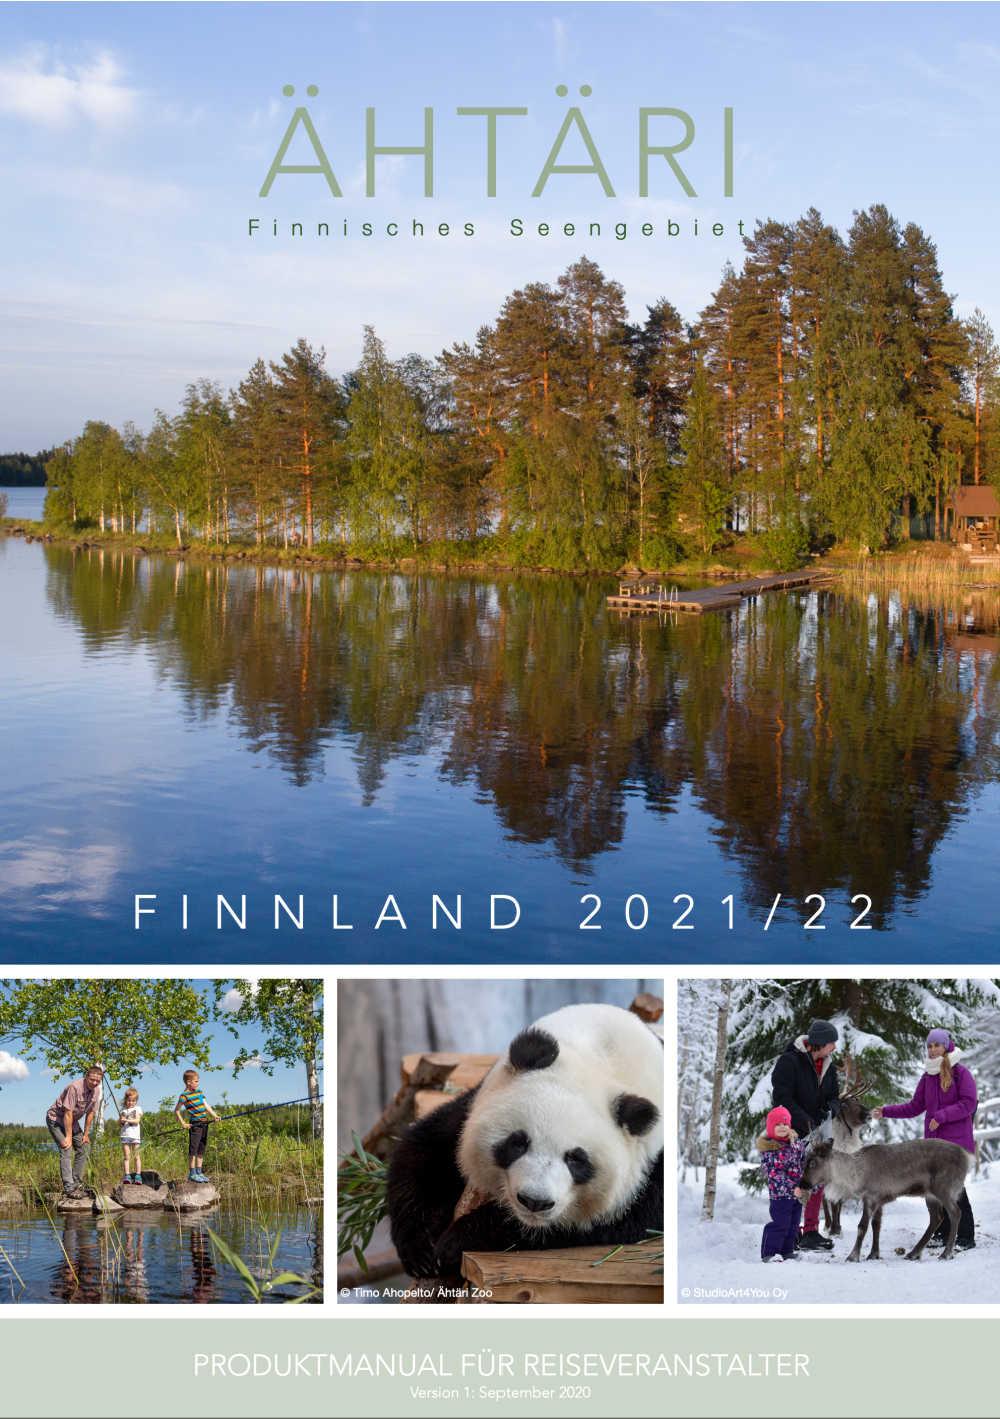 Produktmanual-Ahtari-Finnland-2021-22-DE